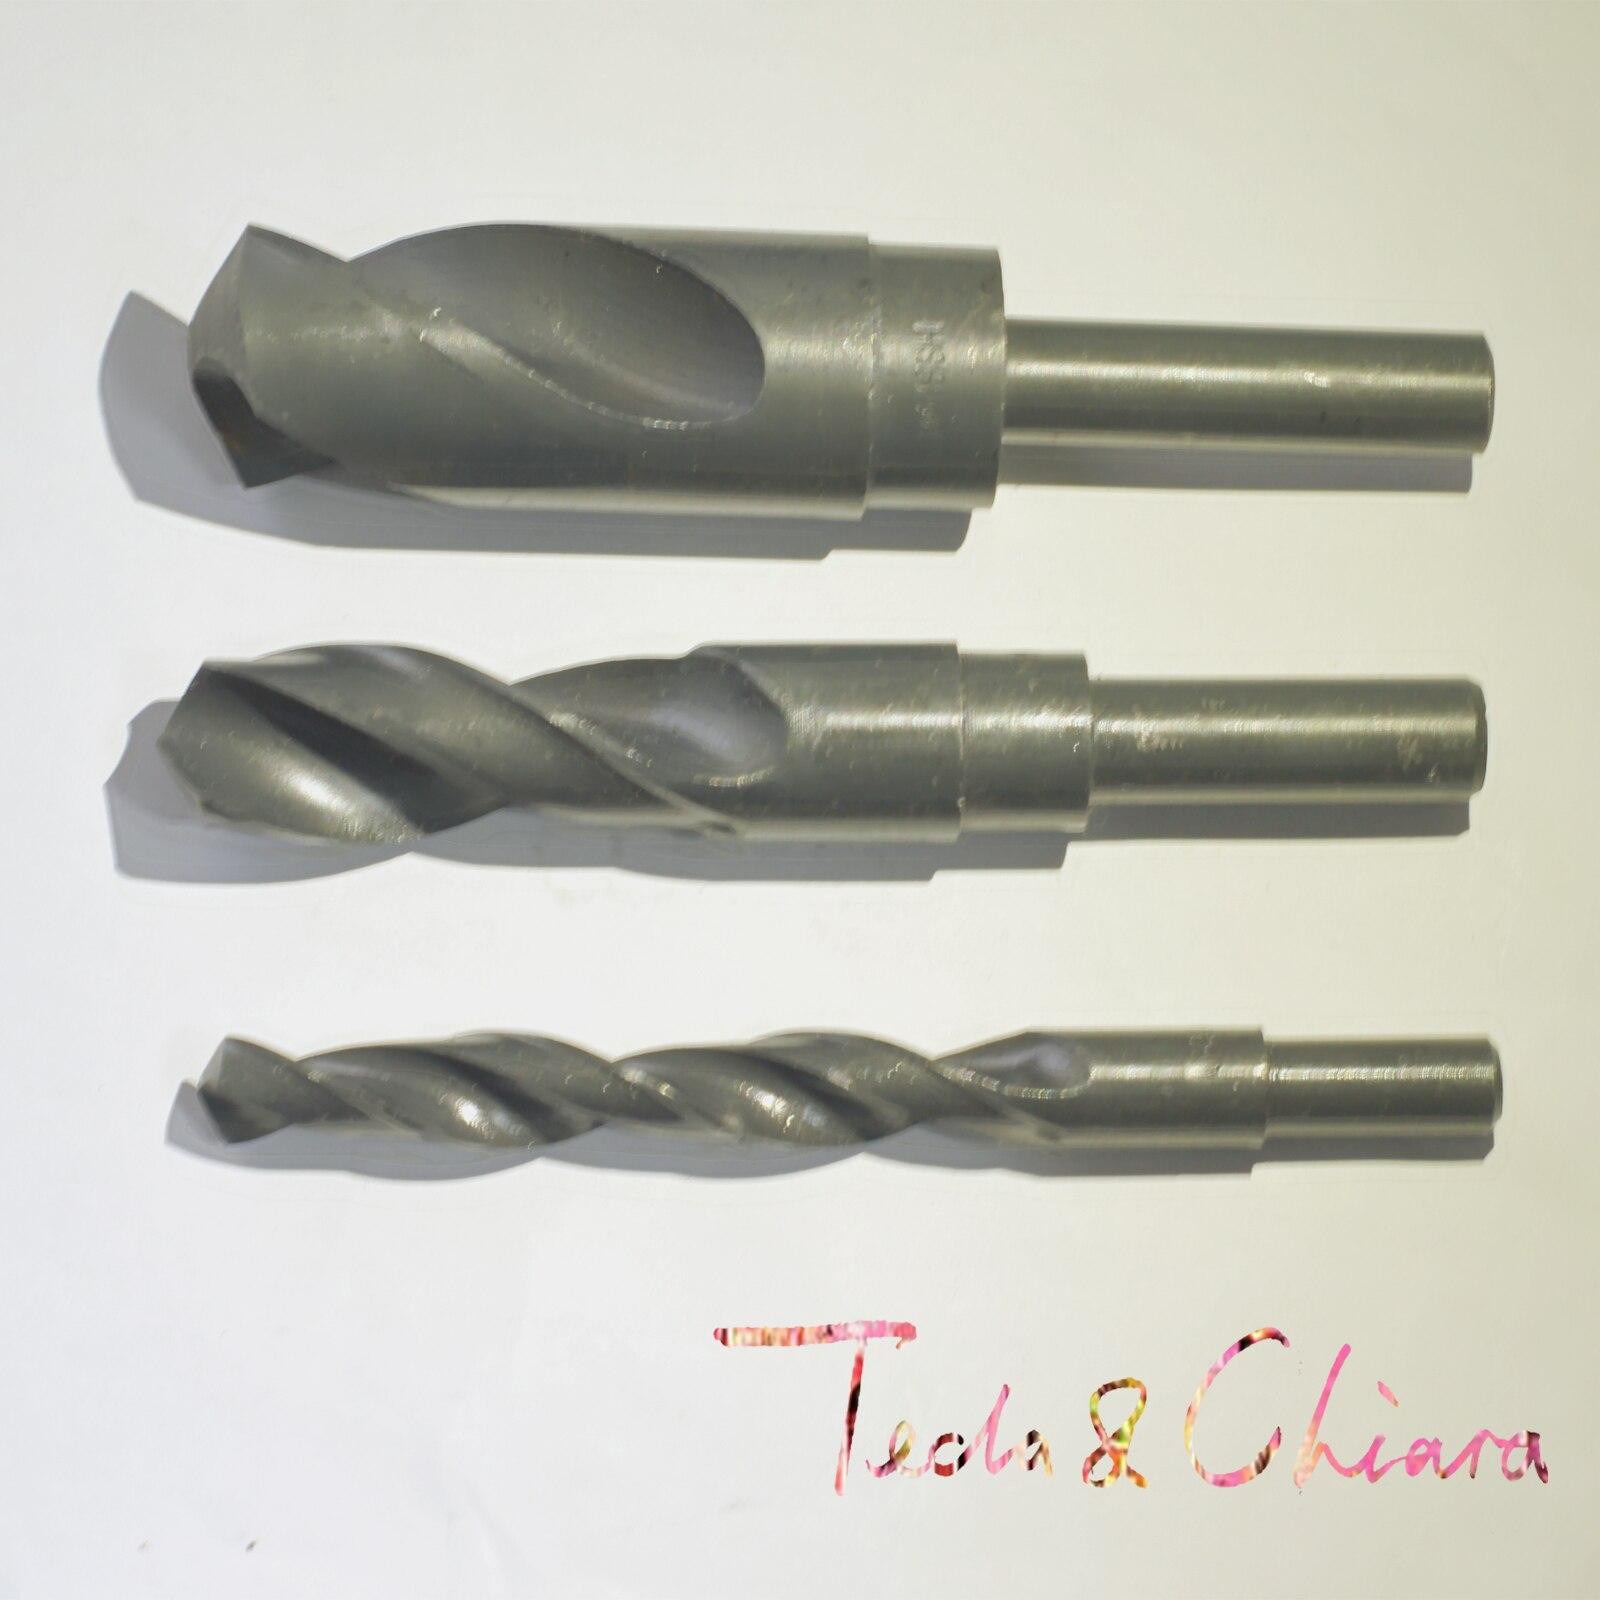 22.1mm 22.2mm 22.3mm 22.4mm 22.5mm HSS Reduced Straight Crank Twist Drill Bit Shank Dia 12.7mm 1/2 inch 22.1 22.2 22.3 22.4 22.522.1mm 22.2mm 22.3mm 22.4mm 22.5mm HSS Reduced Straight Crank Twist Drill Bit Shank Dia 12.7mm 1/2 inch 22.1 22.2 22.3 22.4 22.5